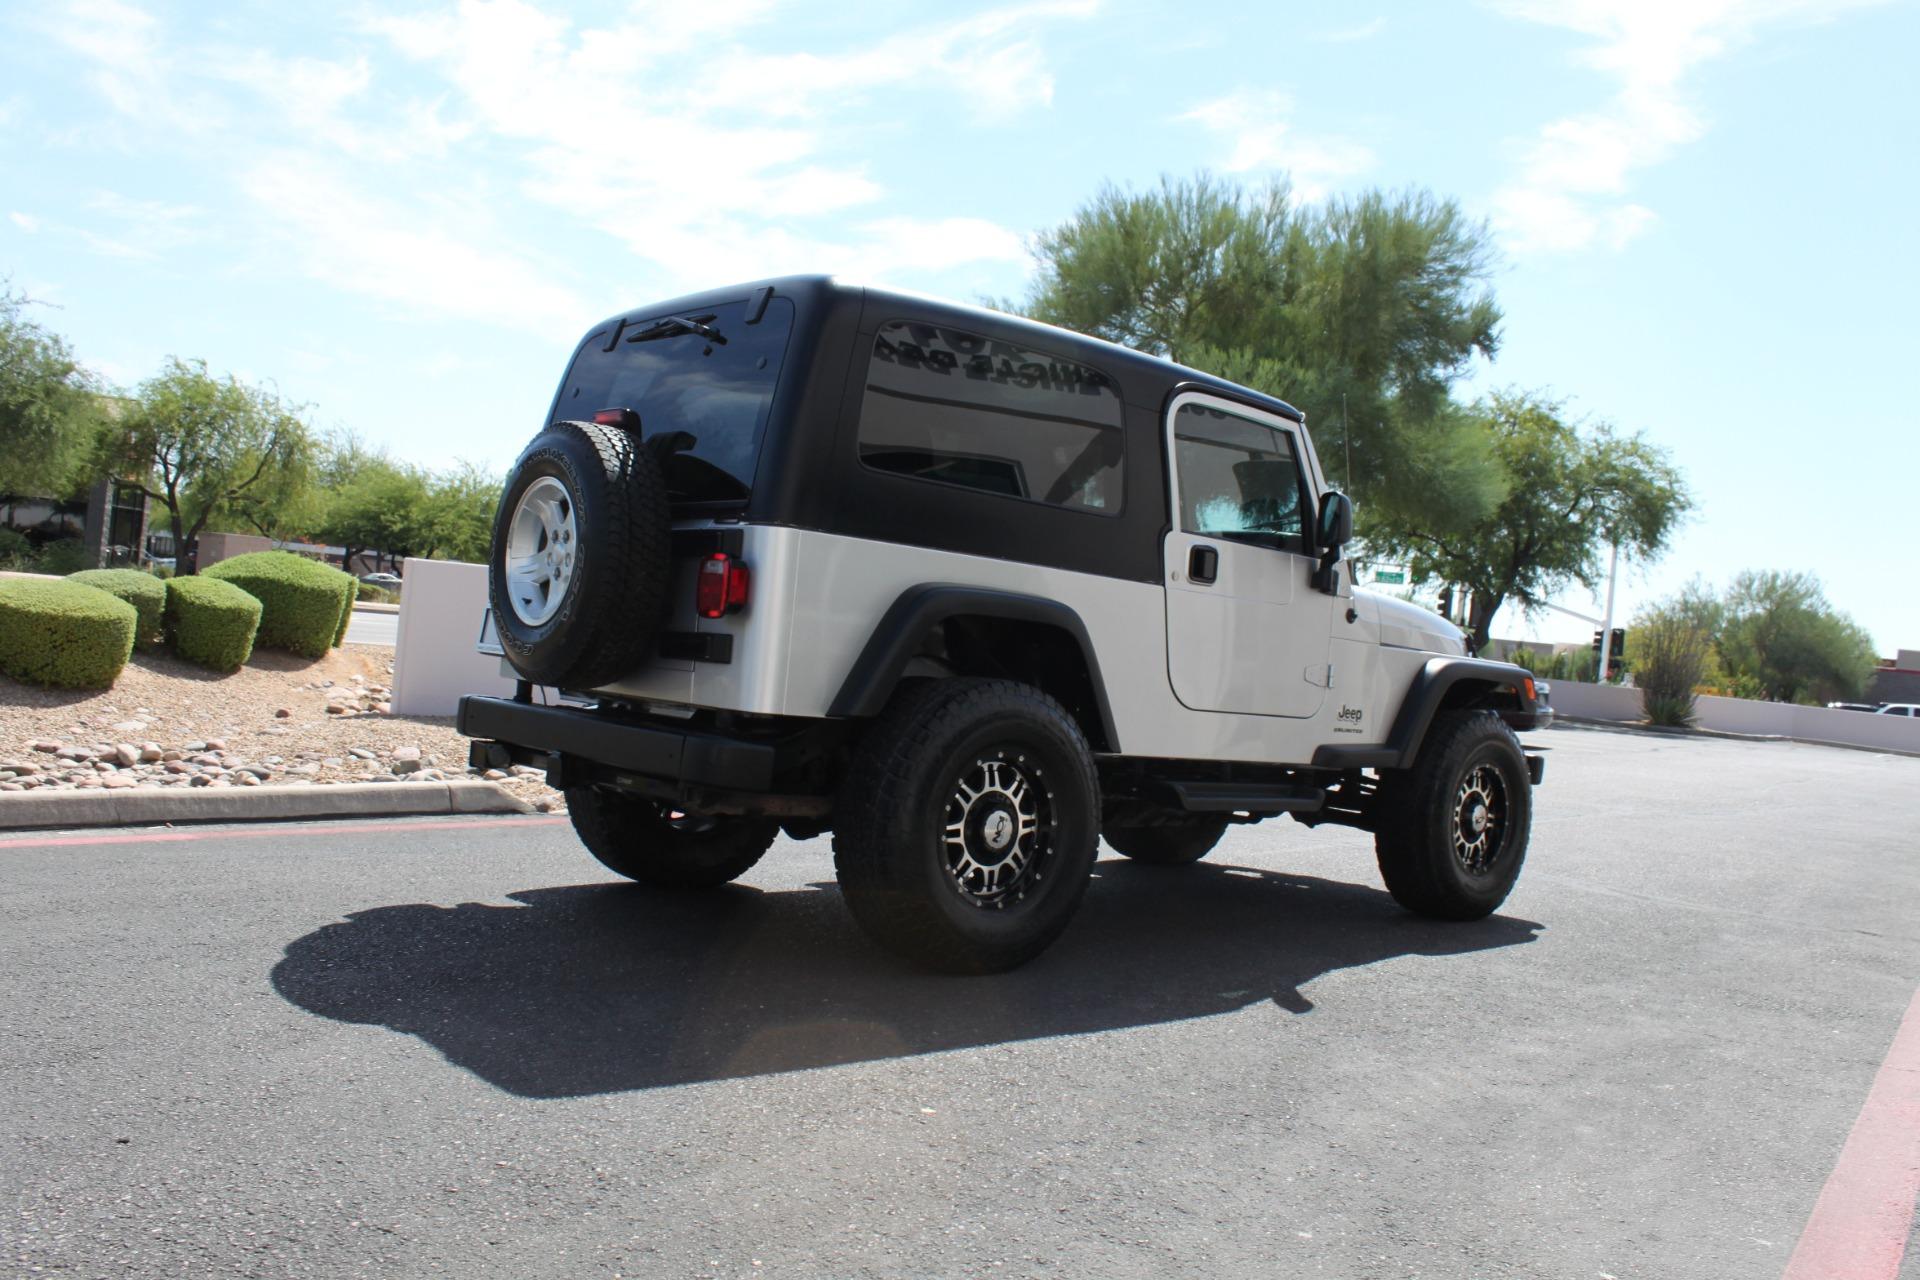 Used-2006-Jeep-Wrangler-Unlimited-LWB-Alfa-Romeo